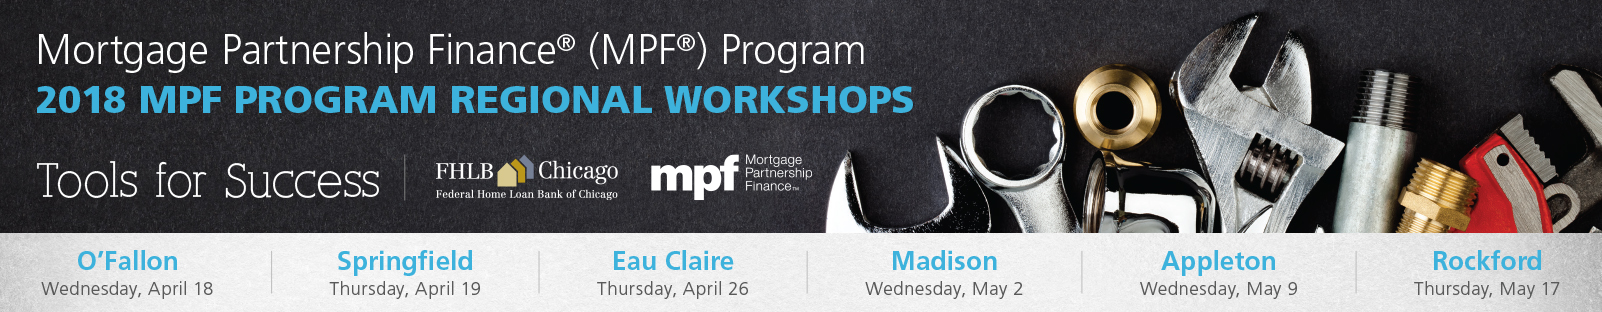 2018 MPF® Program Regional Workshops